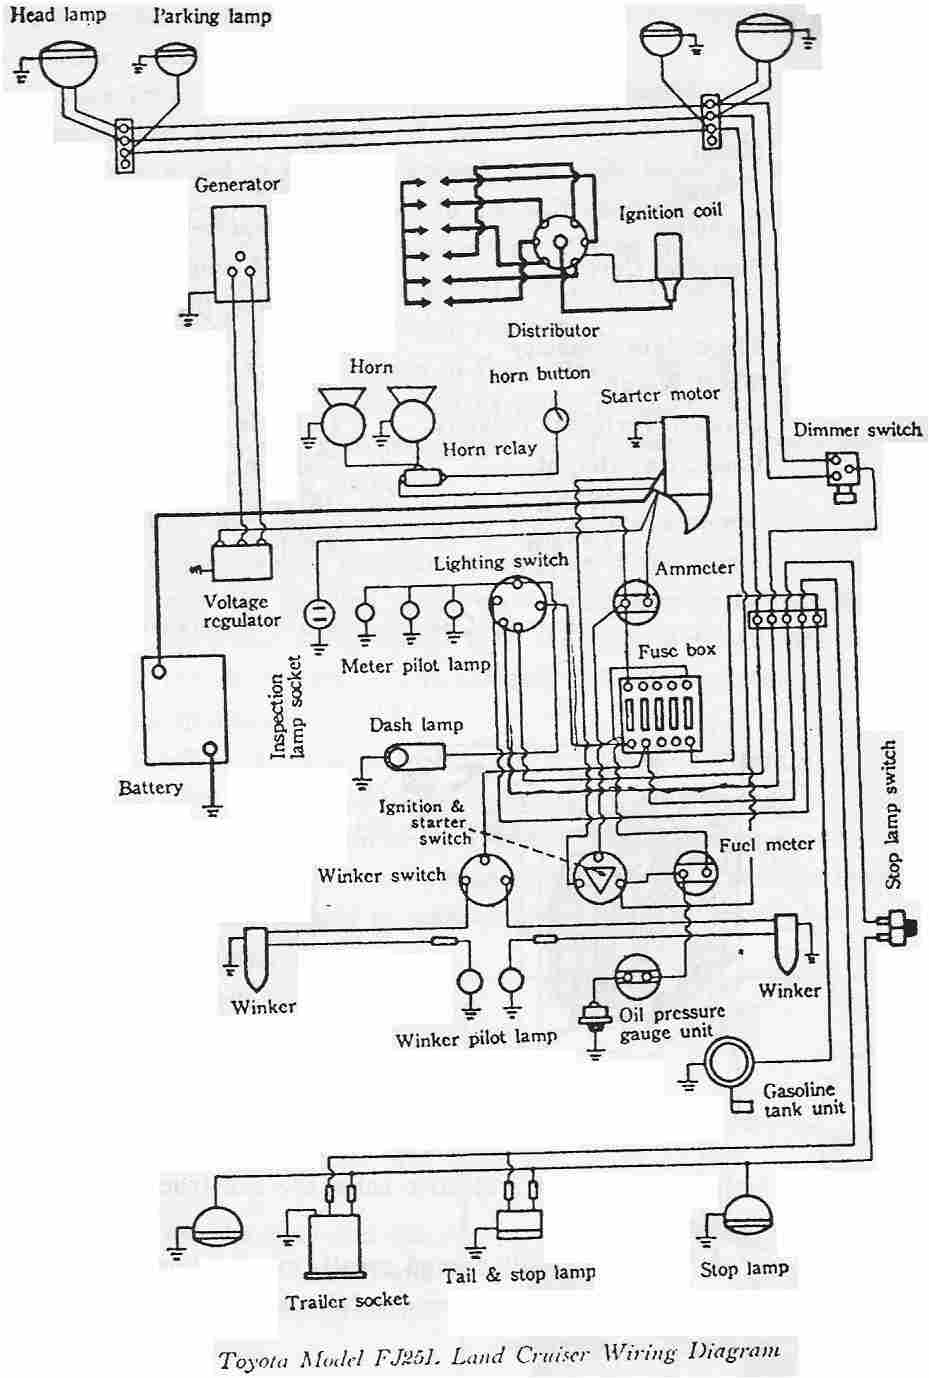 Toyota Land Cruiser FJ25 Electrical Wiring Diagram | All ...